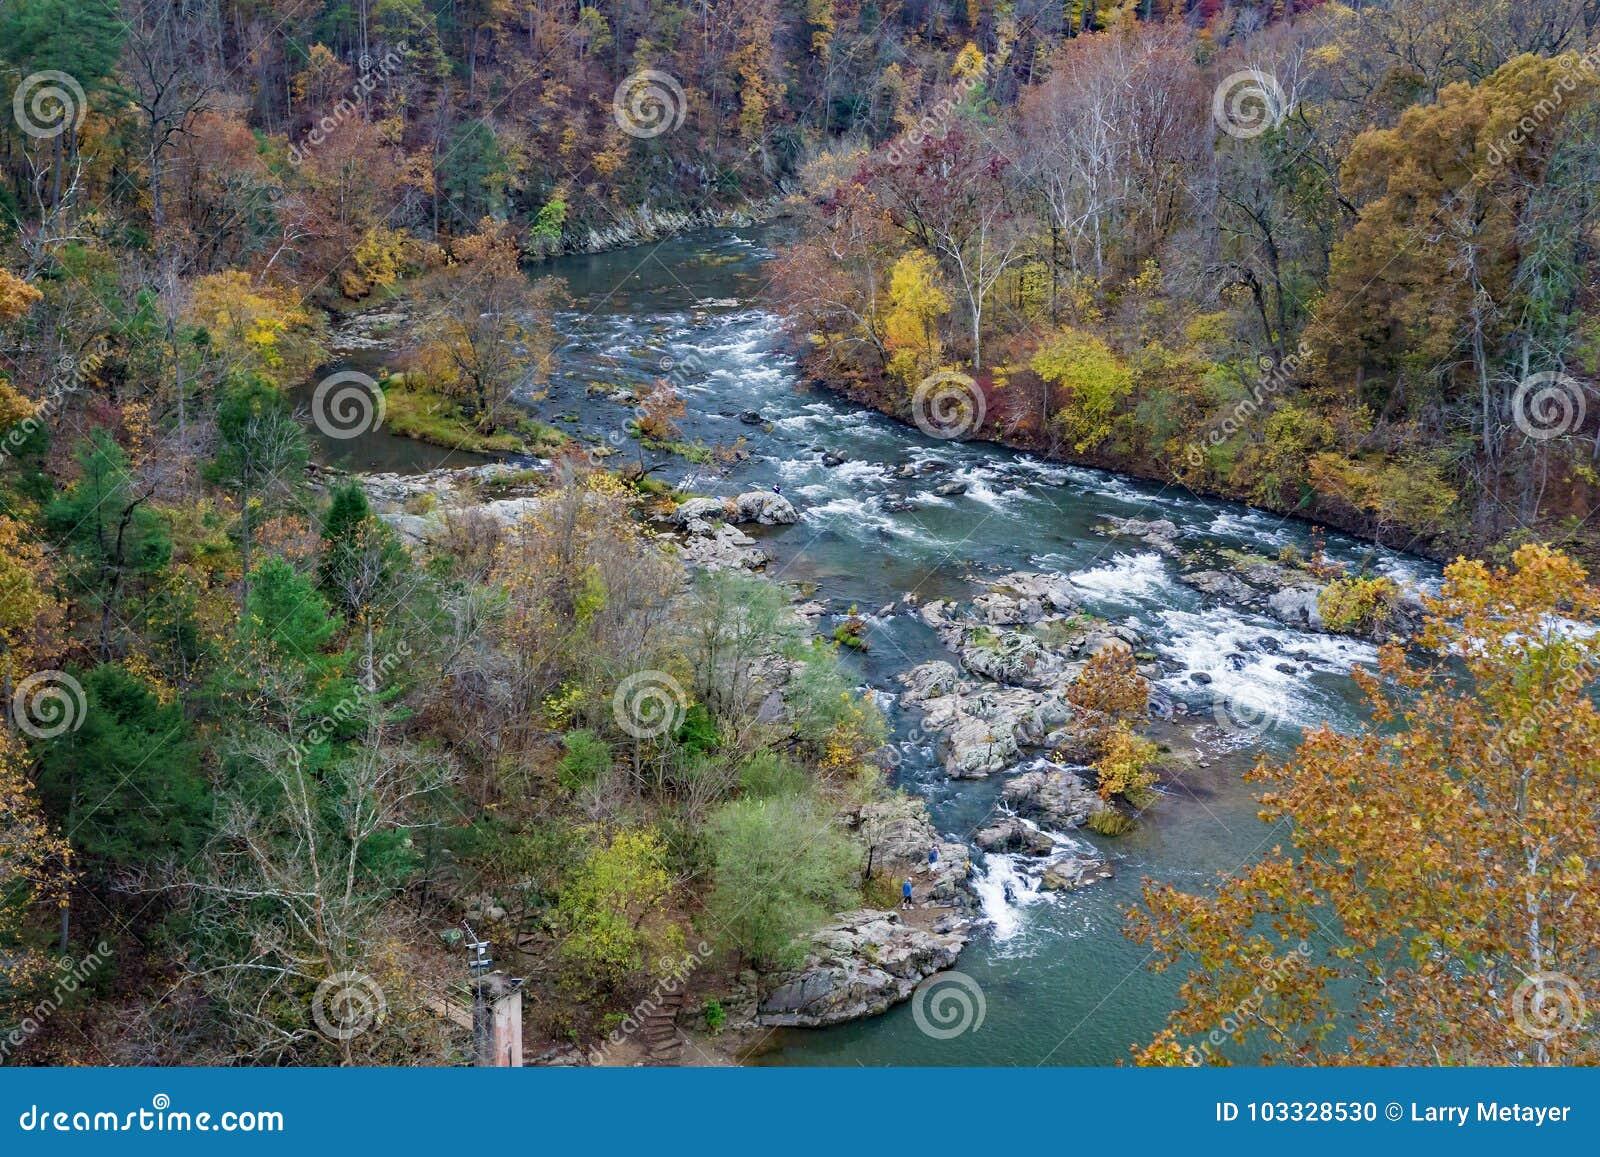 Autumn Foliage on the Roanoke River